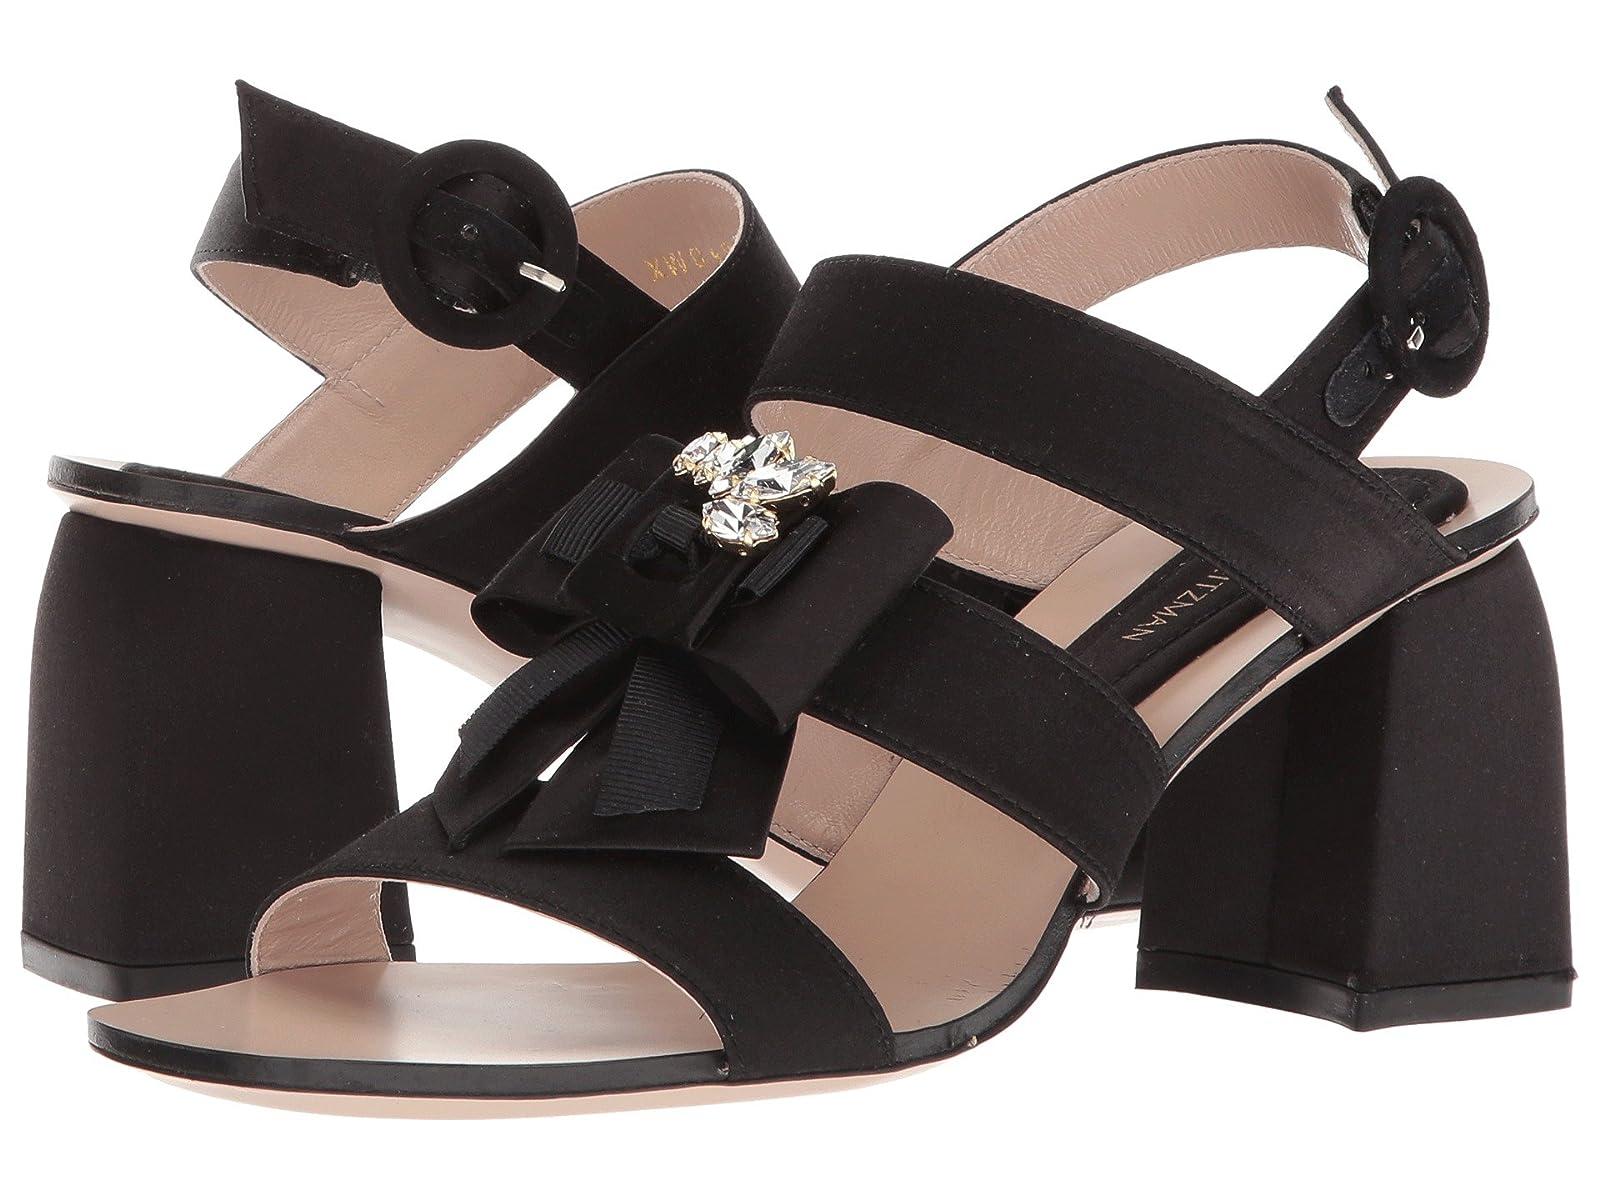 Stuart Weitzman DonnaCheap and distinctive eye-catching shoes